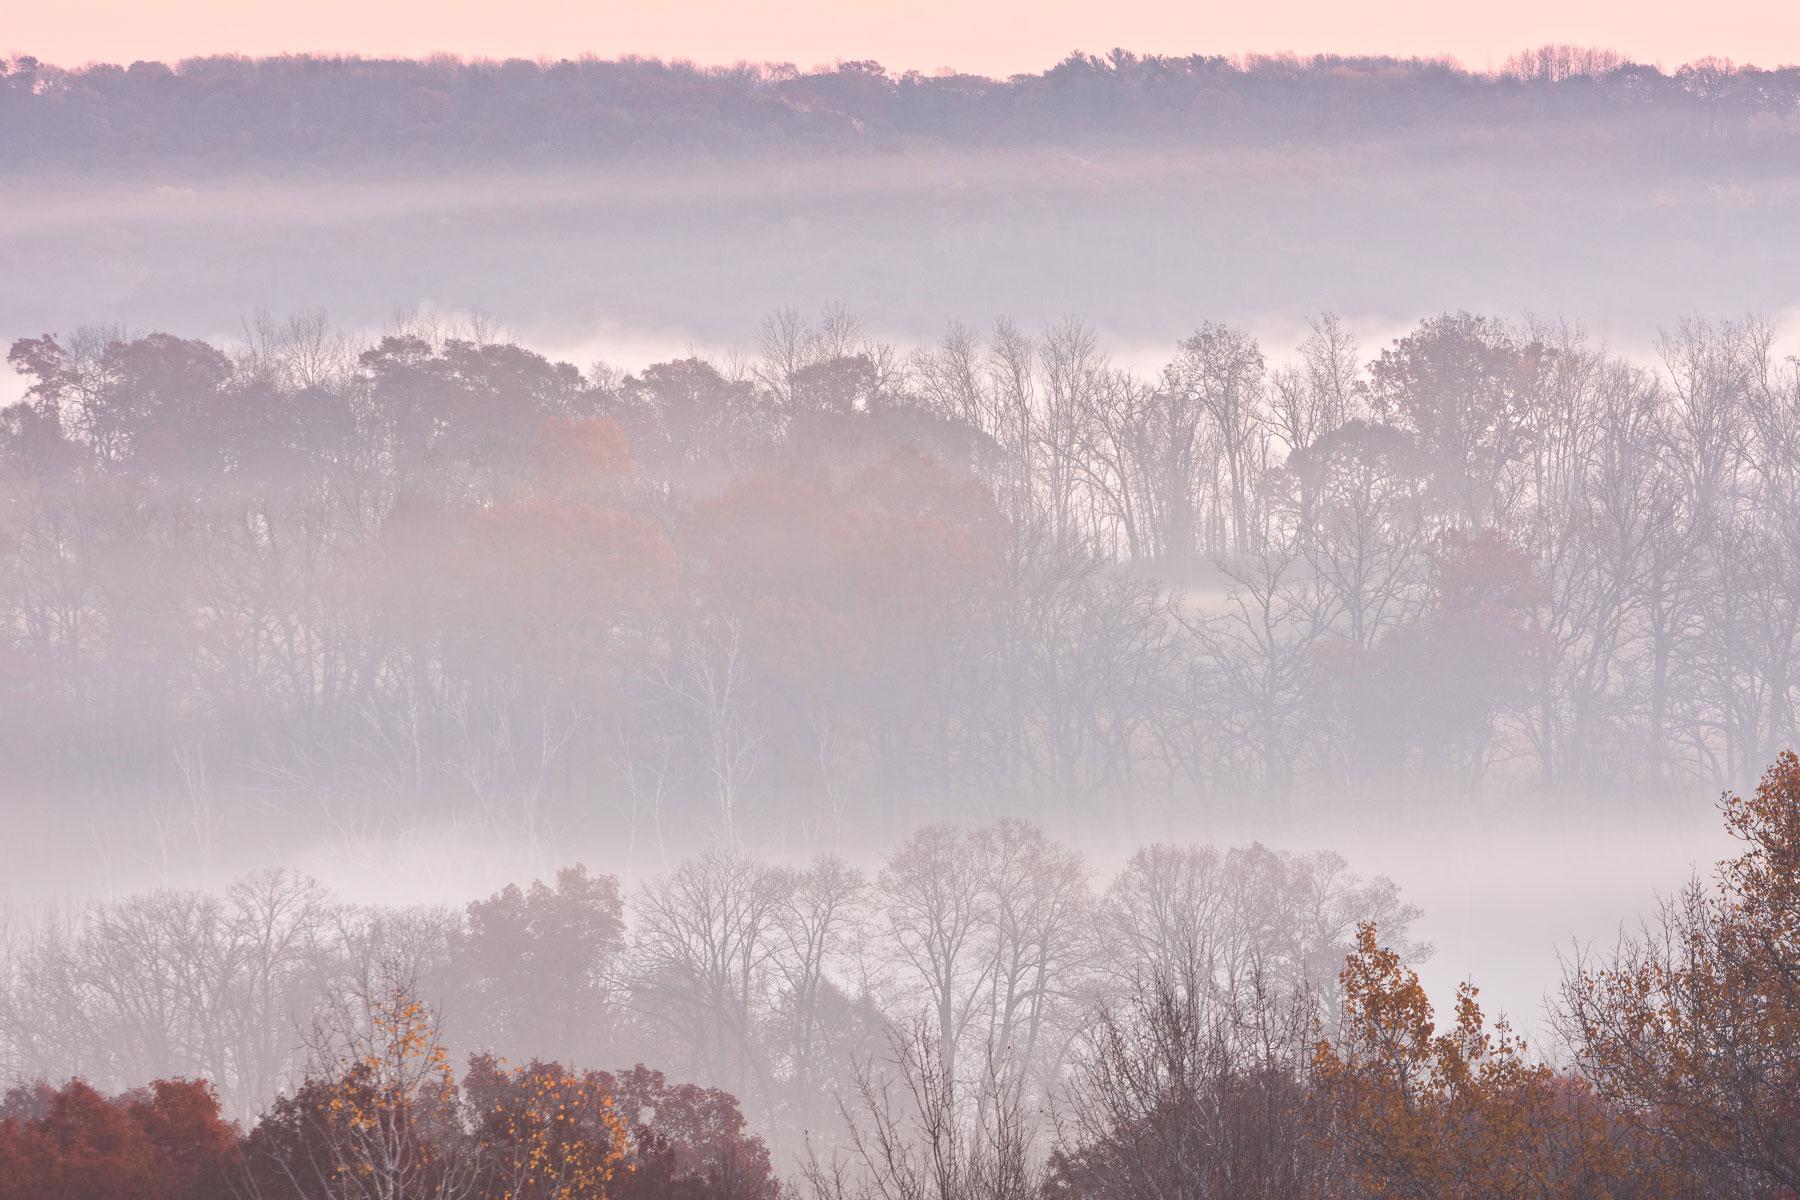 St. Croix Valley Sunrise - Minnesota  Nikon D7200 + Nikon 200-400mm f4.0 VR